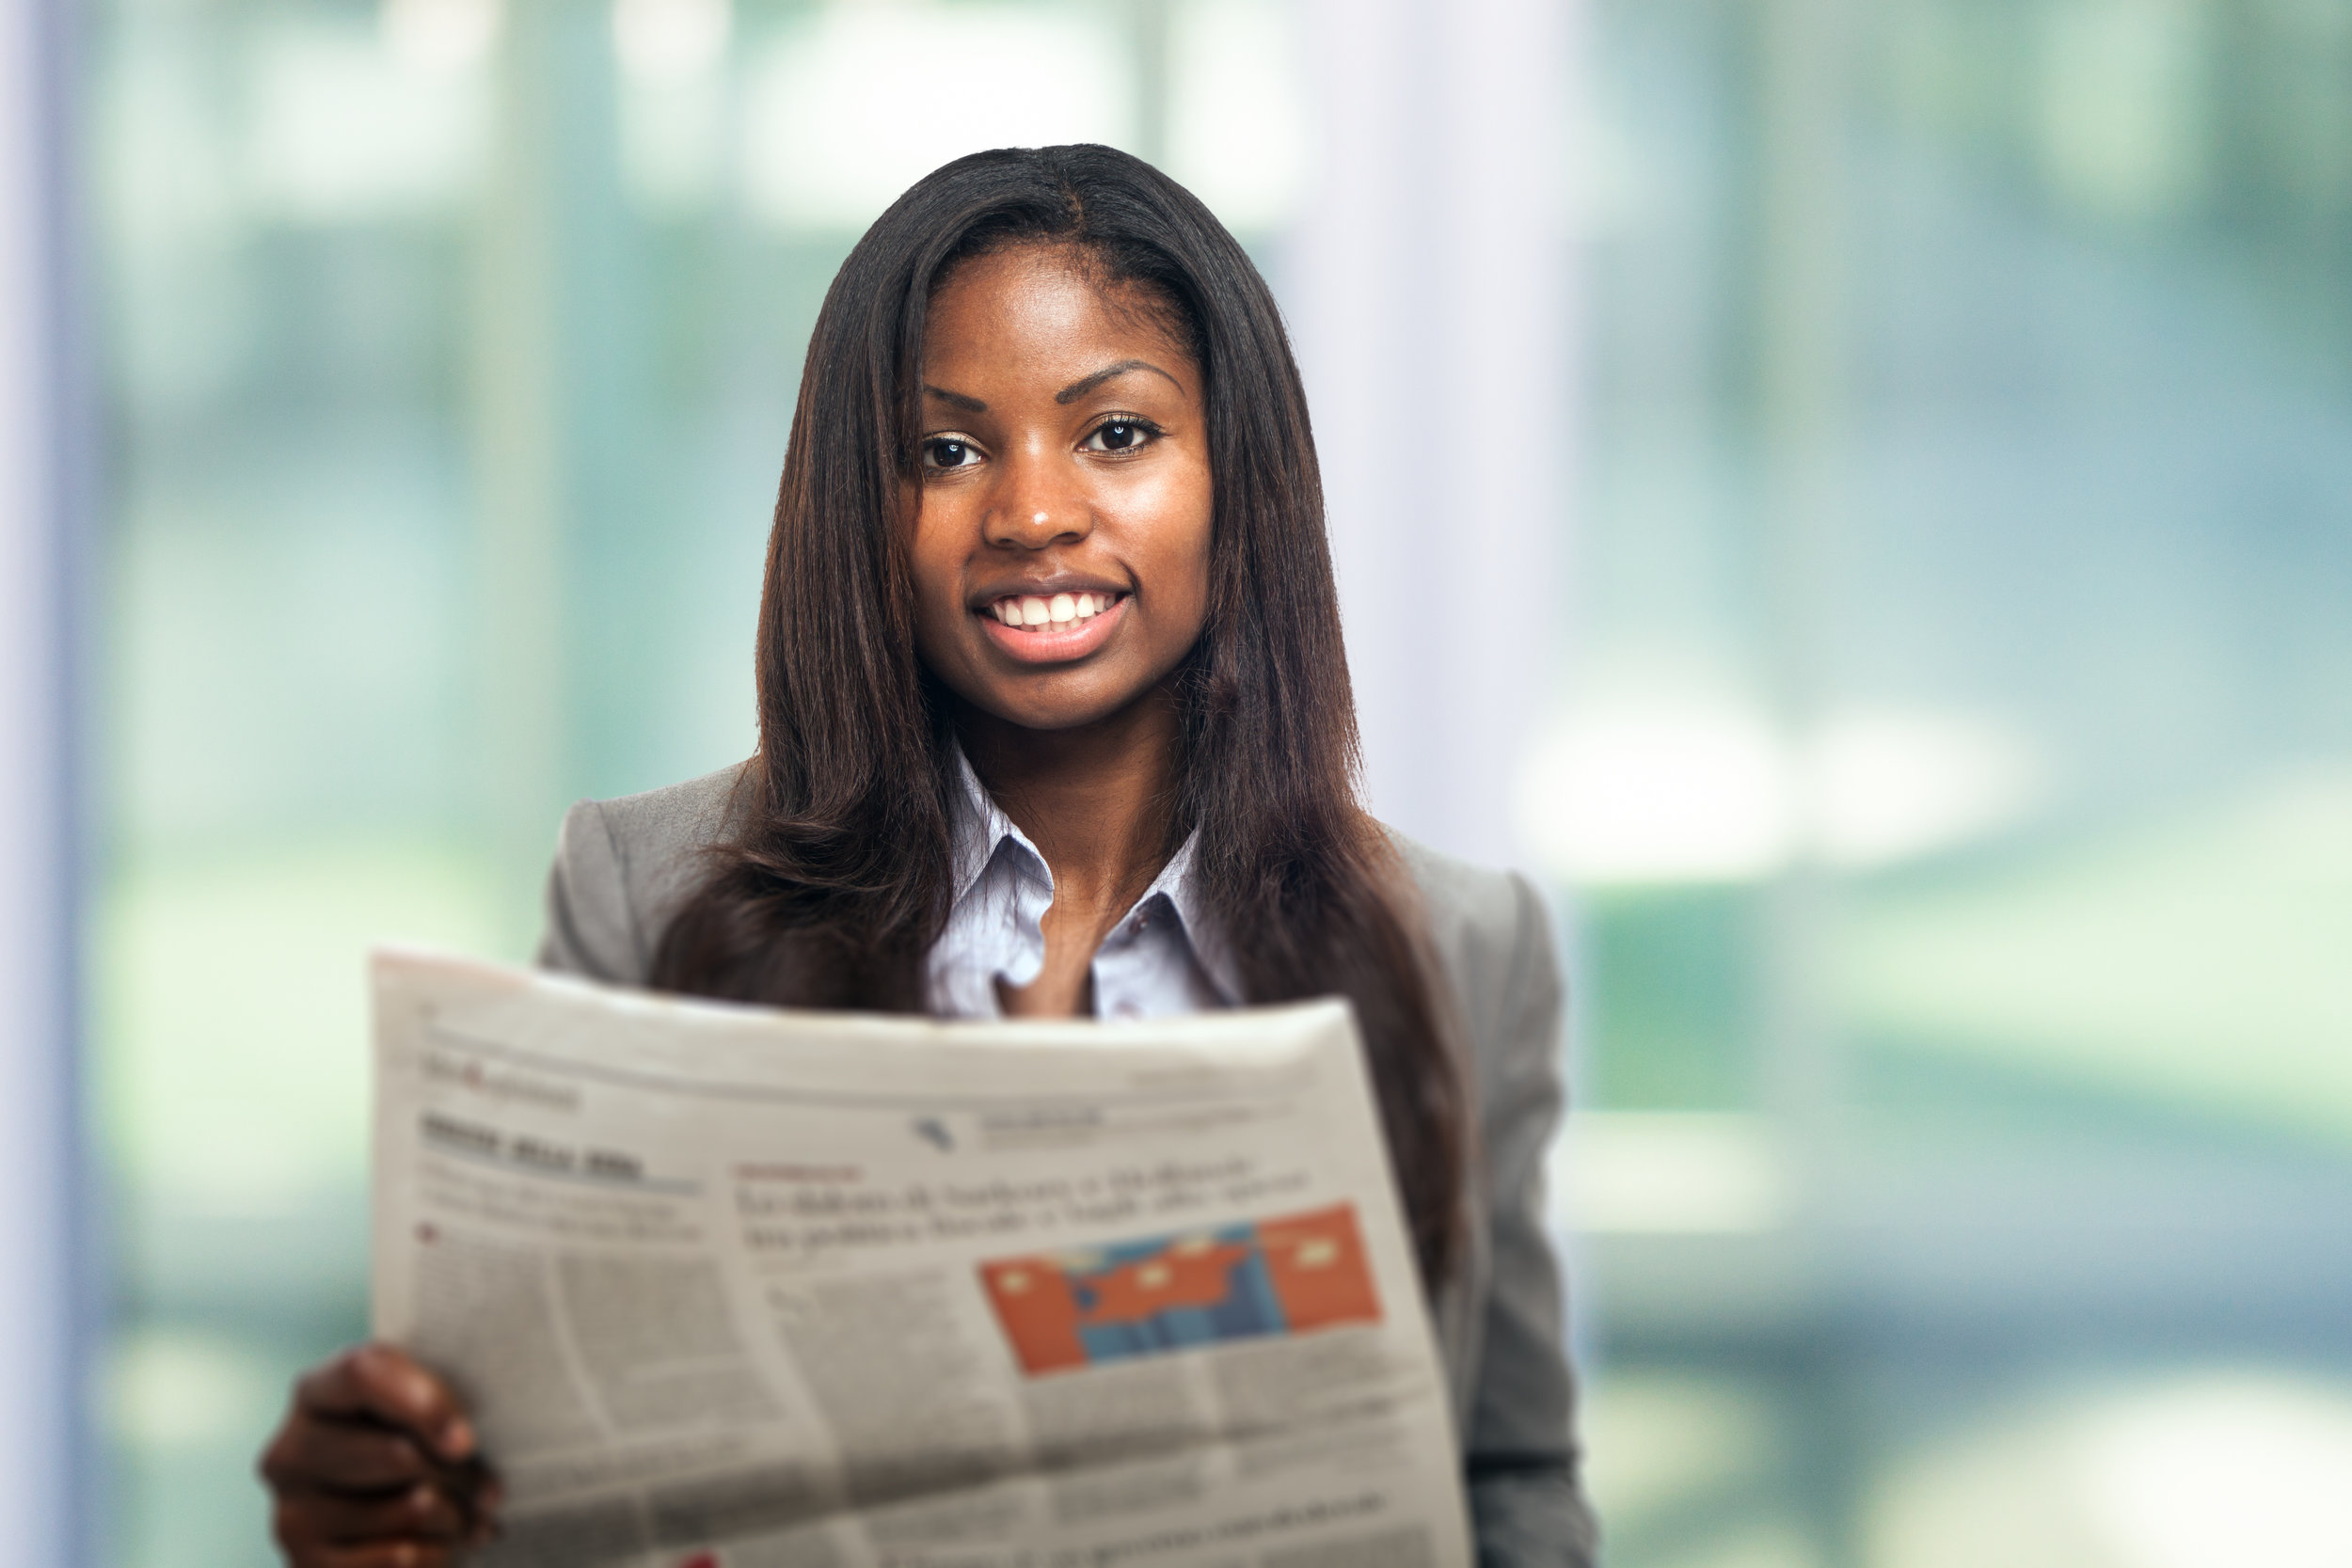 Femmes_Black_Newspaper_97837777.jpeg